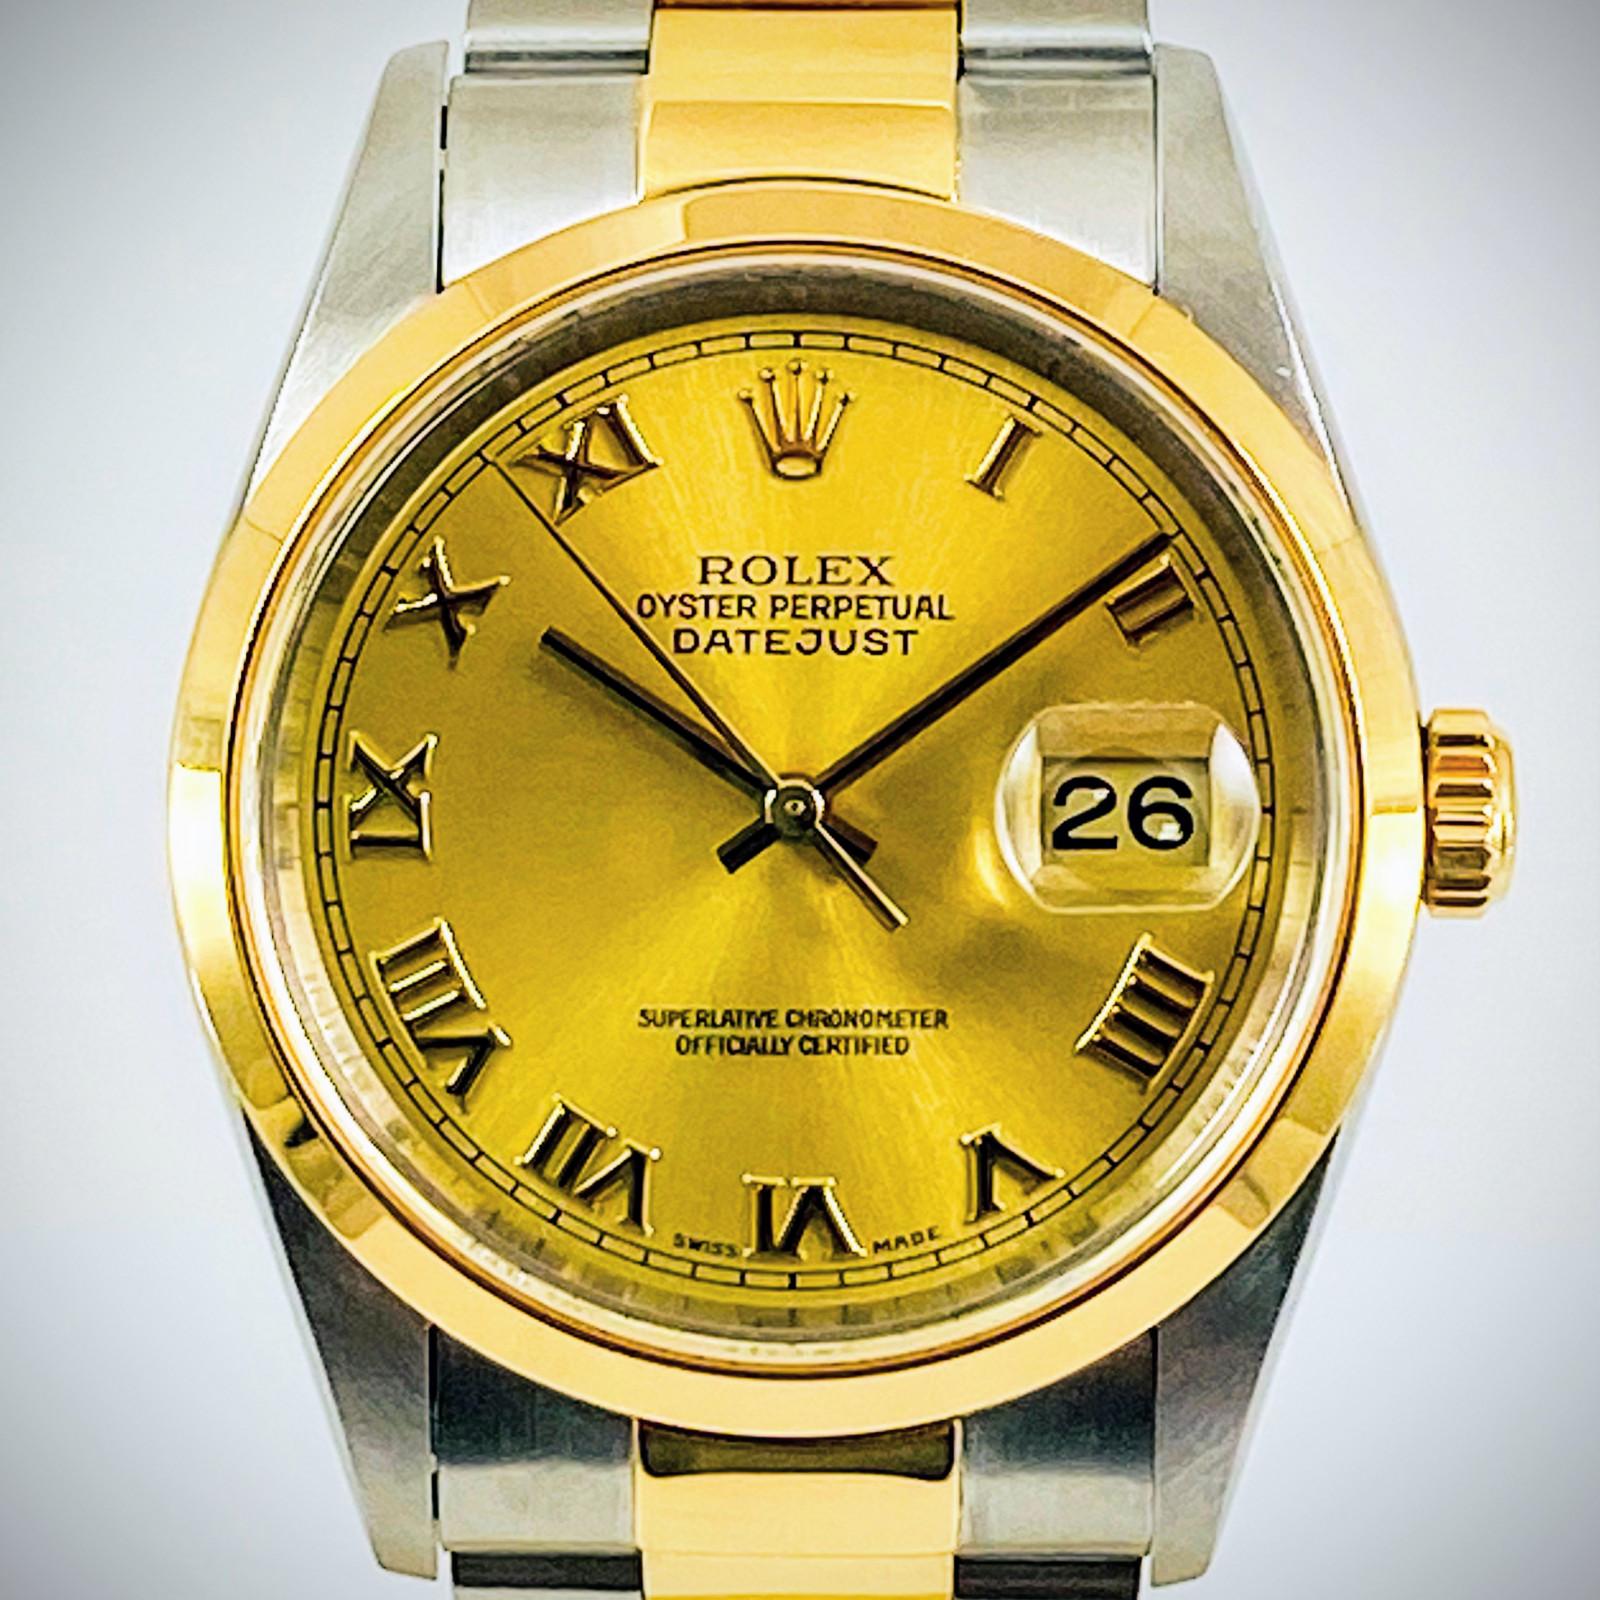 1999 Rolex Datejust 16203